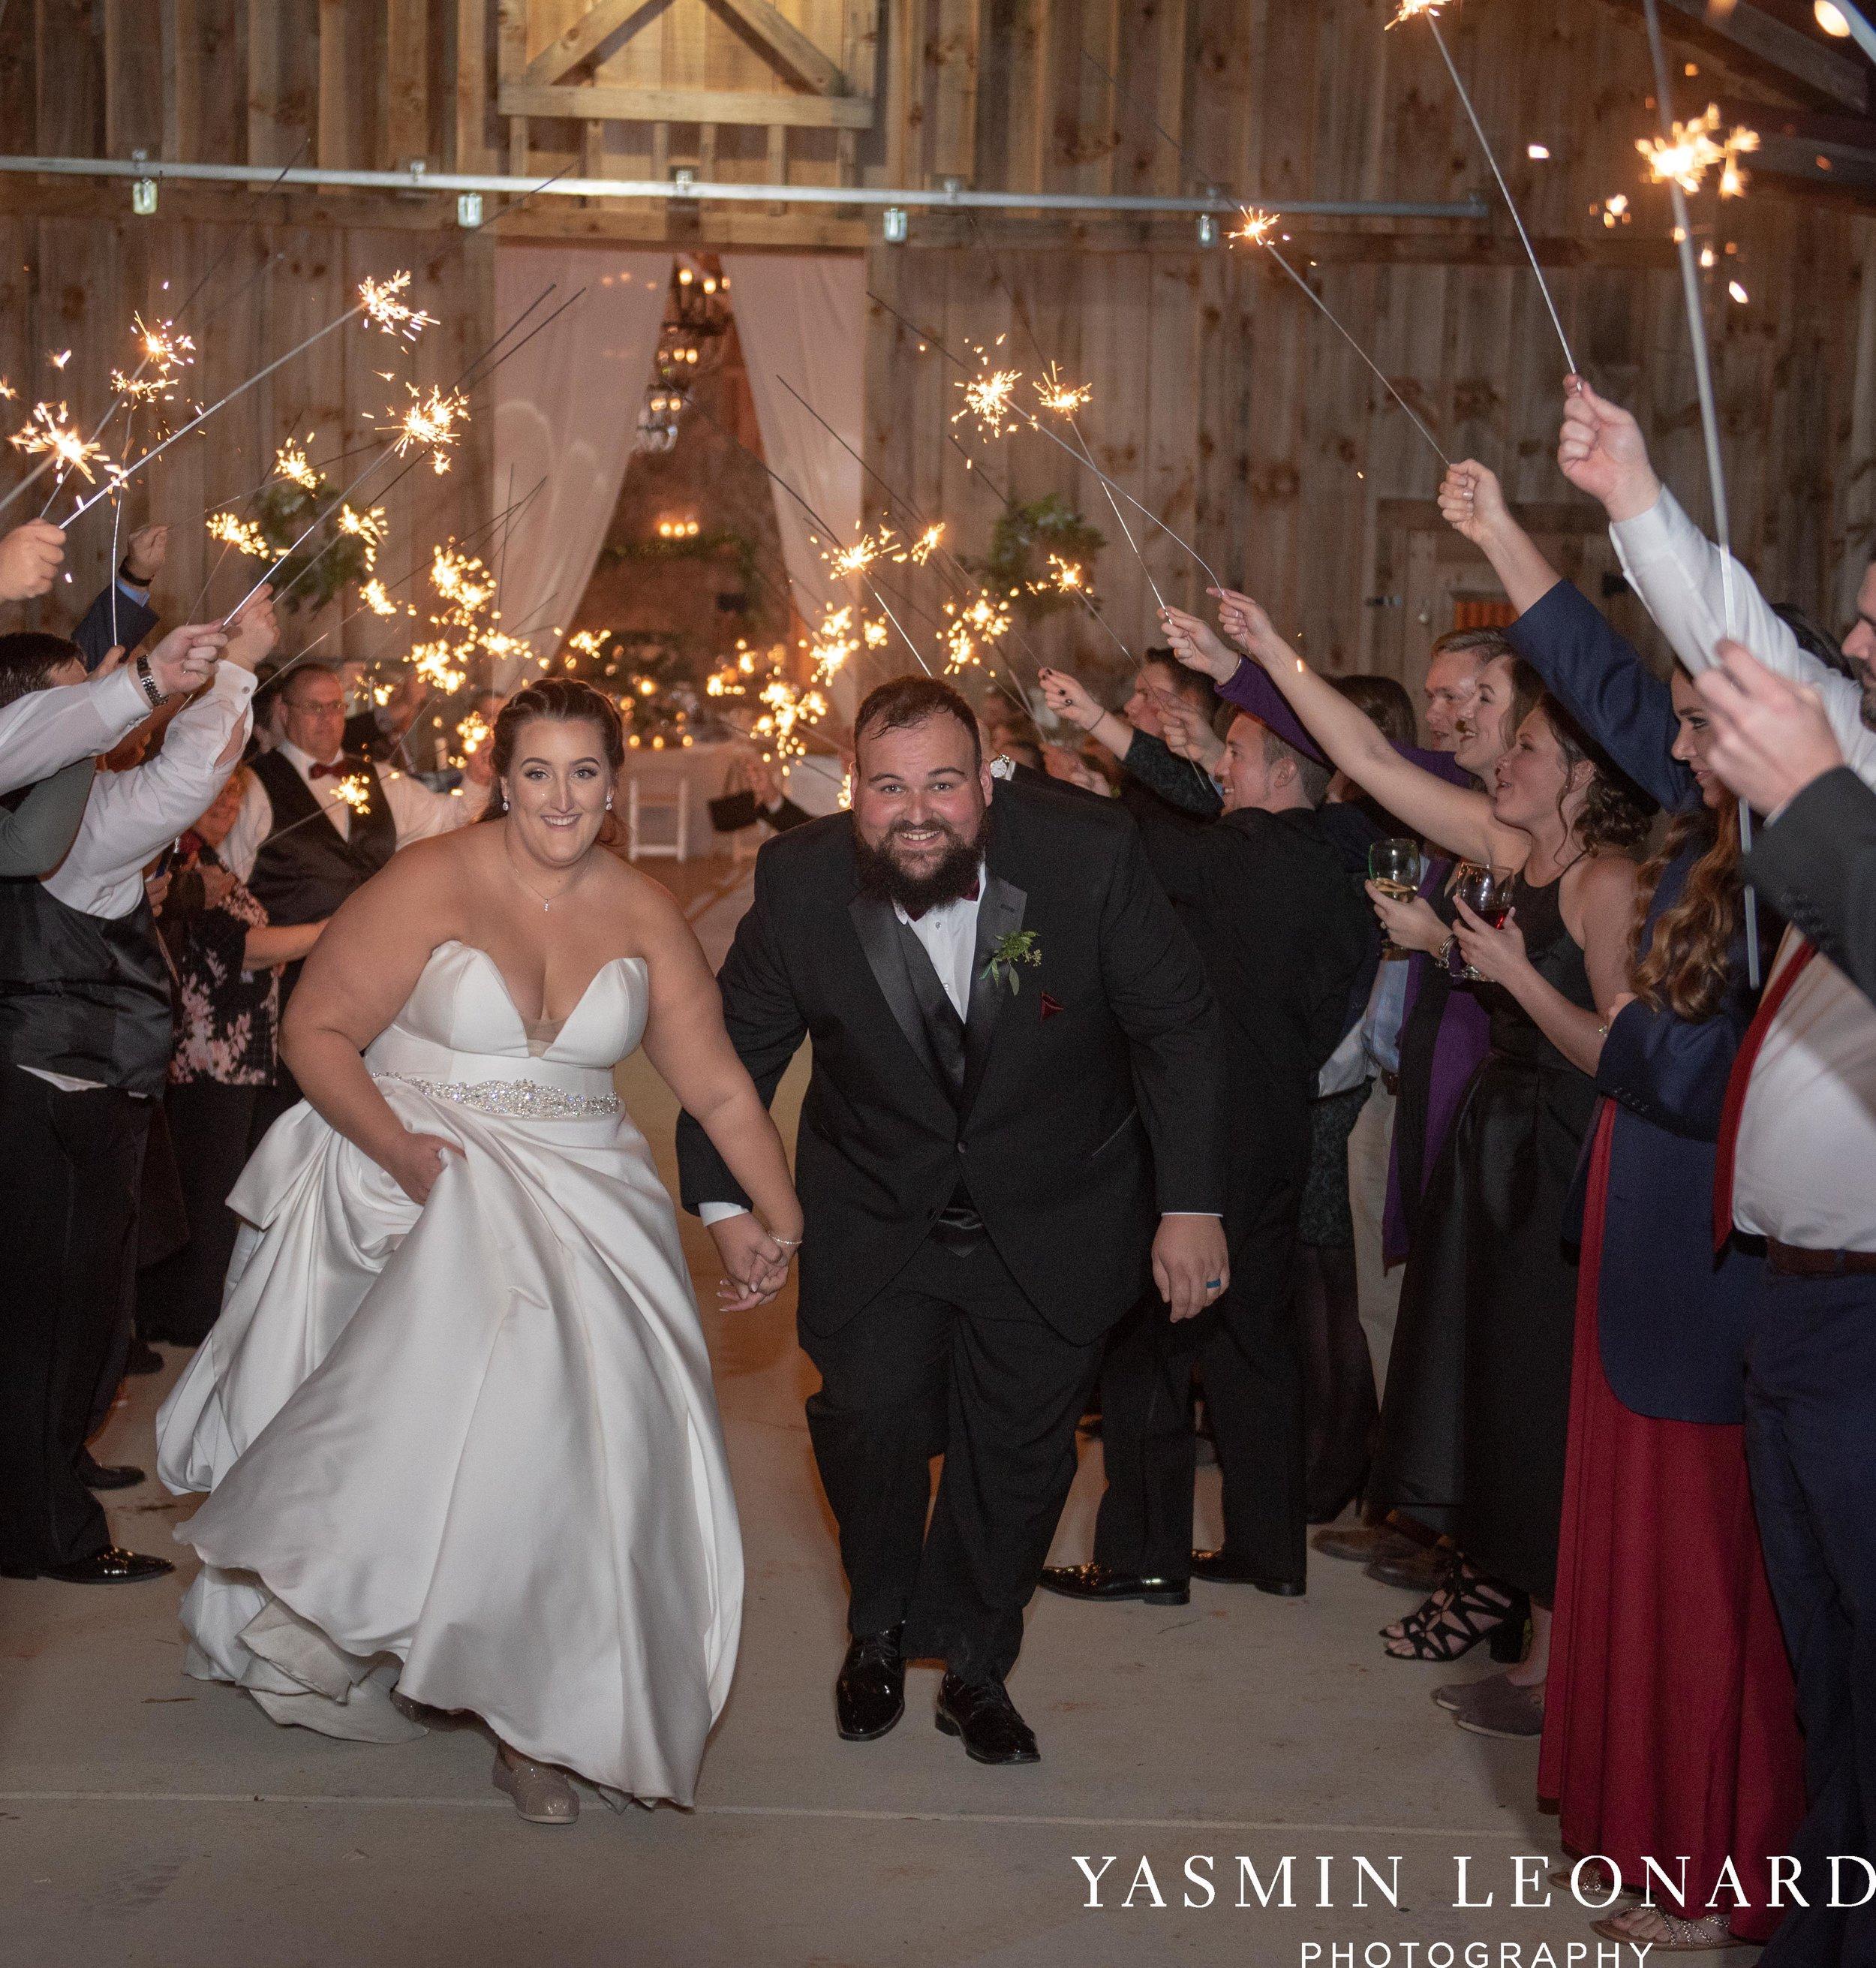 Wesley Memorial United Methodist Church - Old Homeplace Winery - High Point Weddings - High Point Wedding Photographer - NC Weddings - NC Barn Venue - Yasmin Leonard Photography-75.jpg